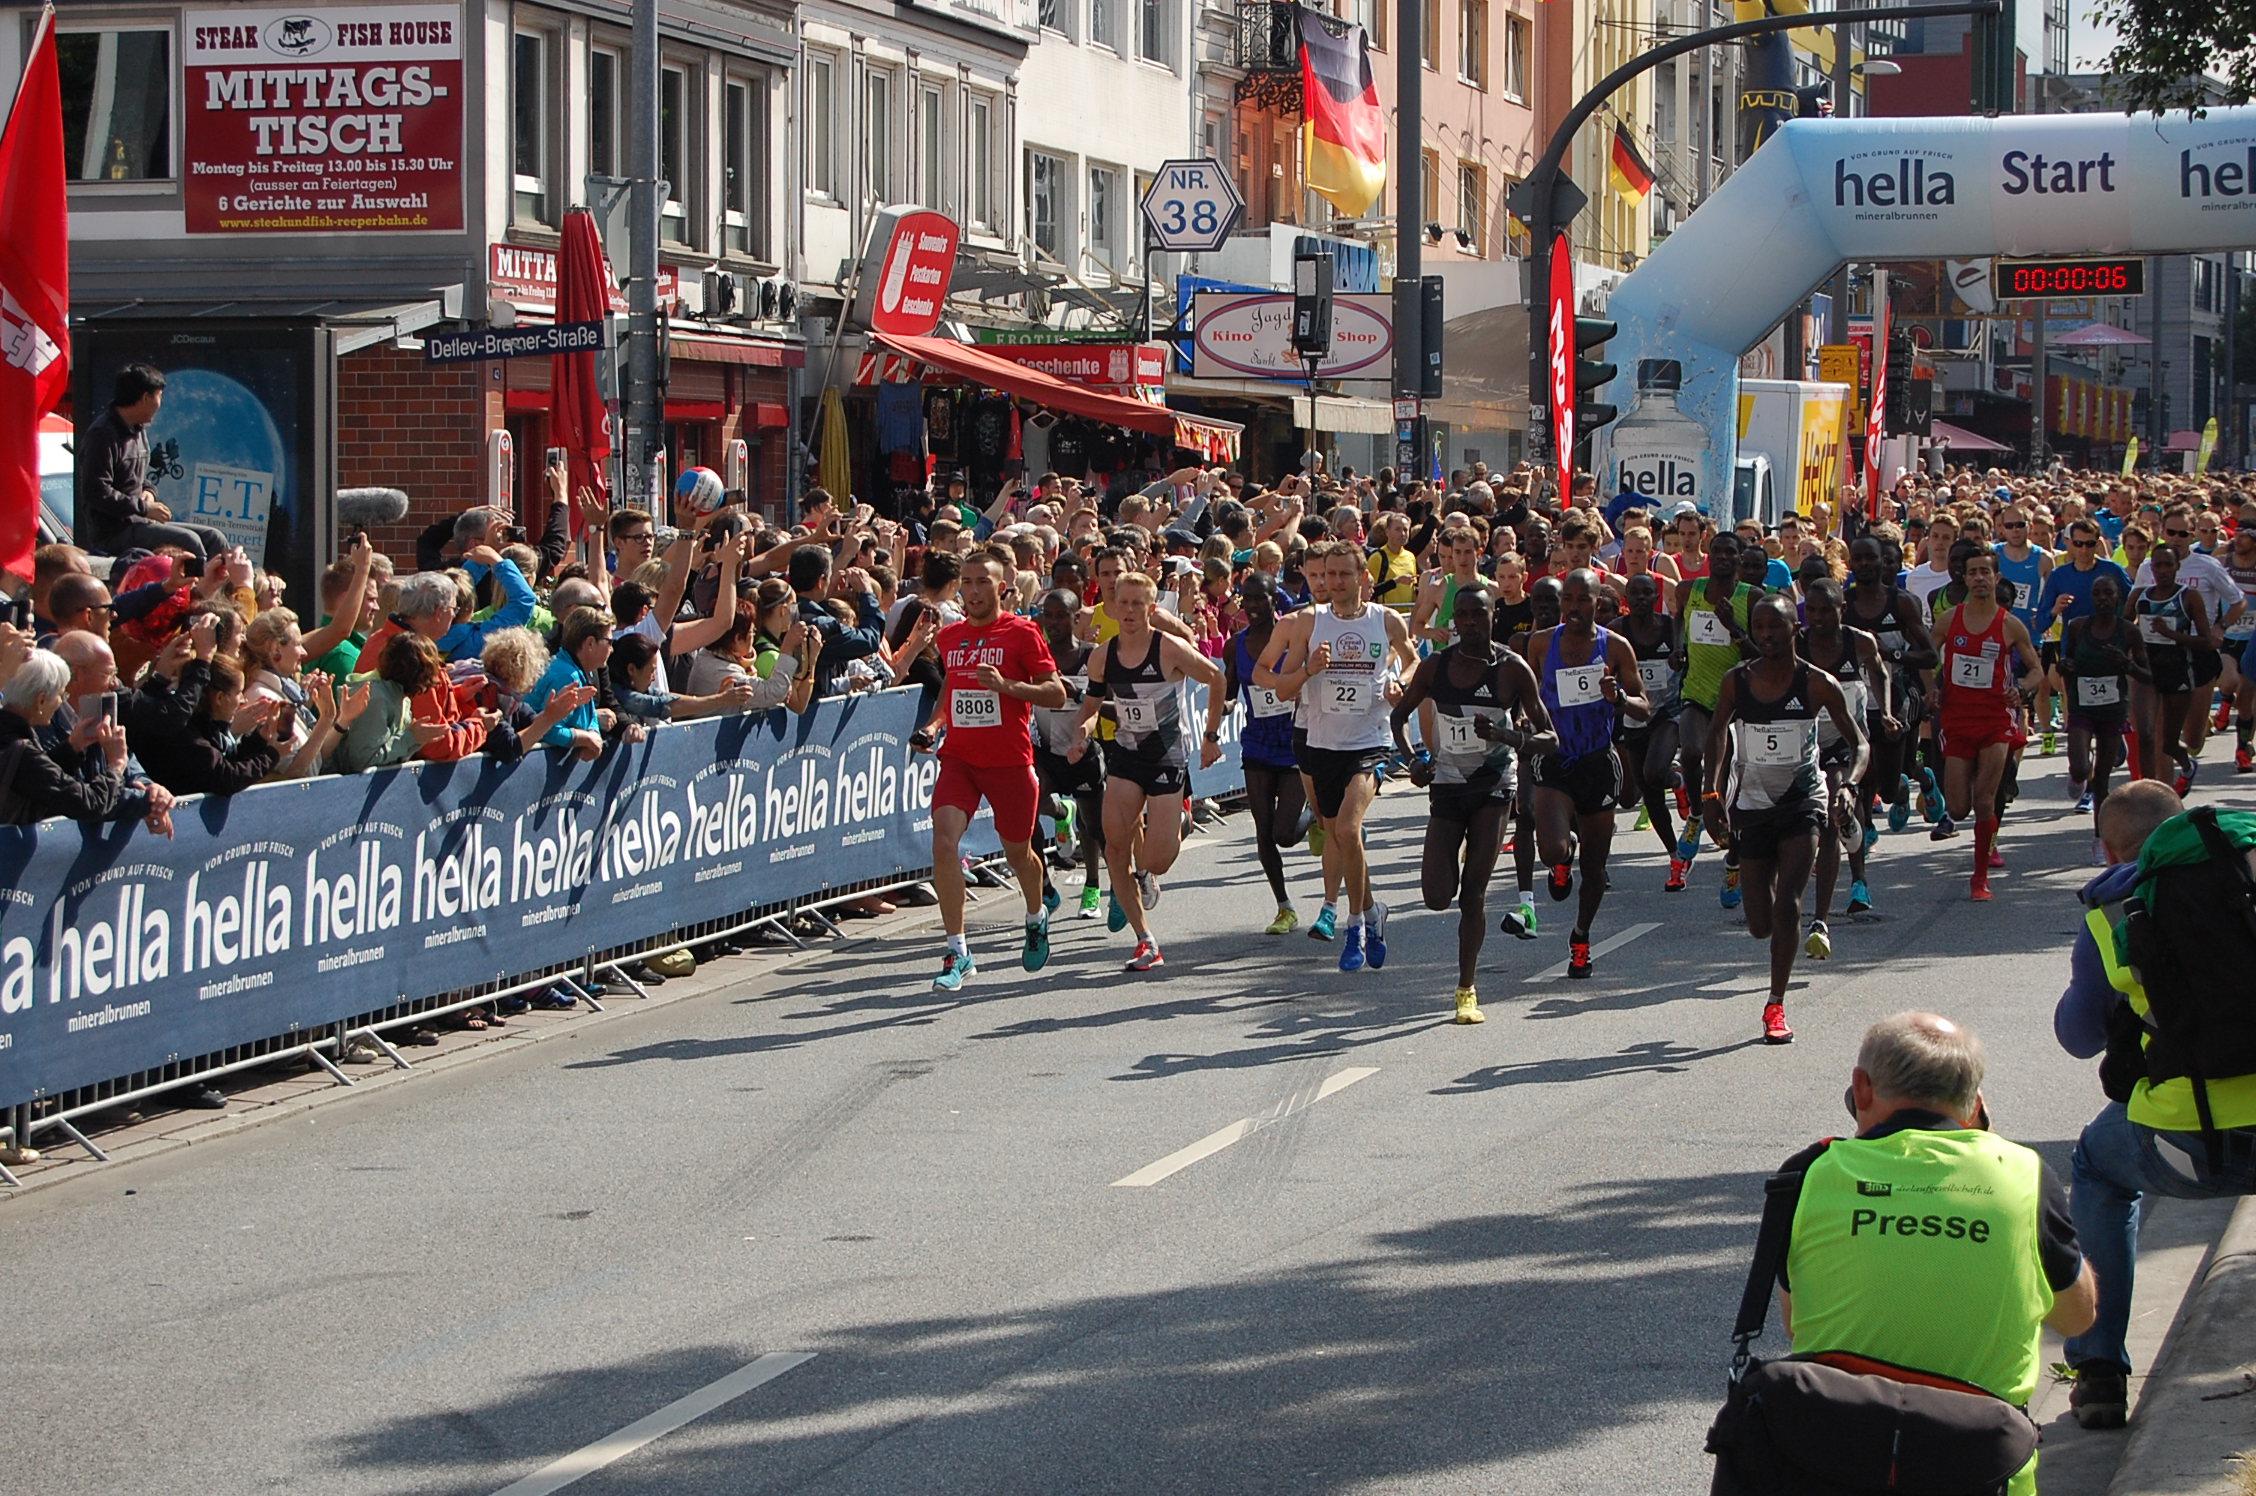 22. hella Halbmarathon: Start